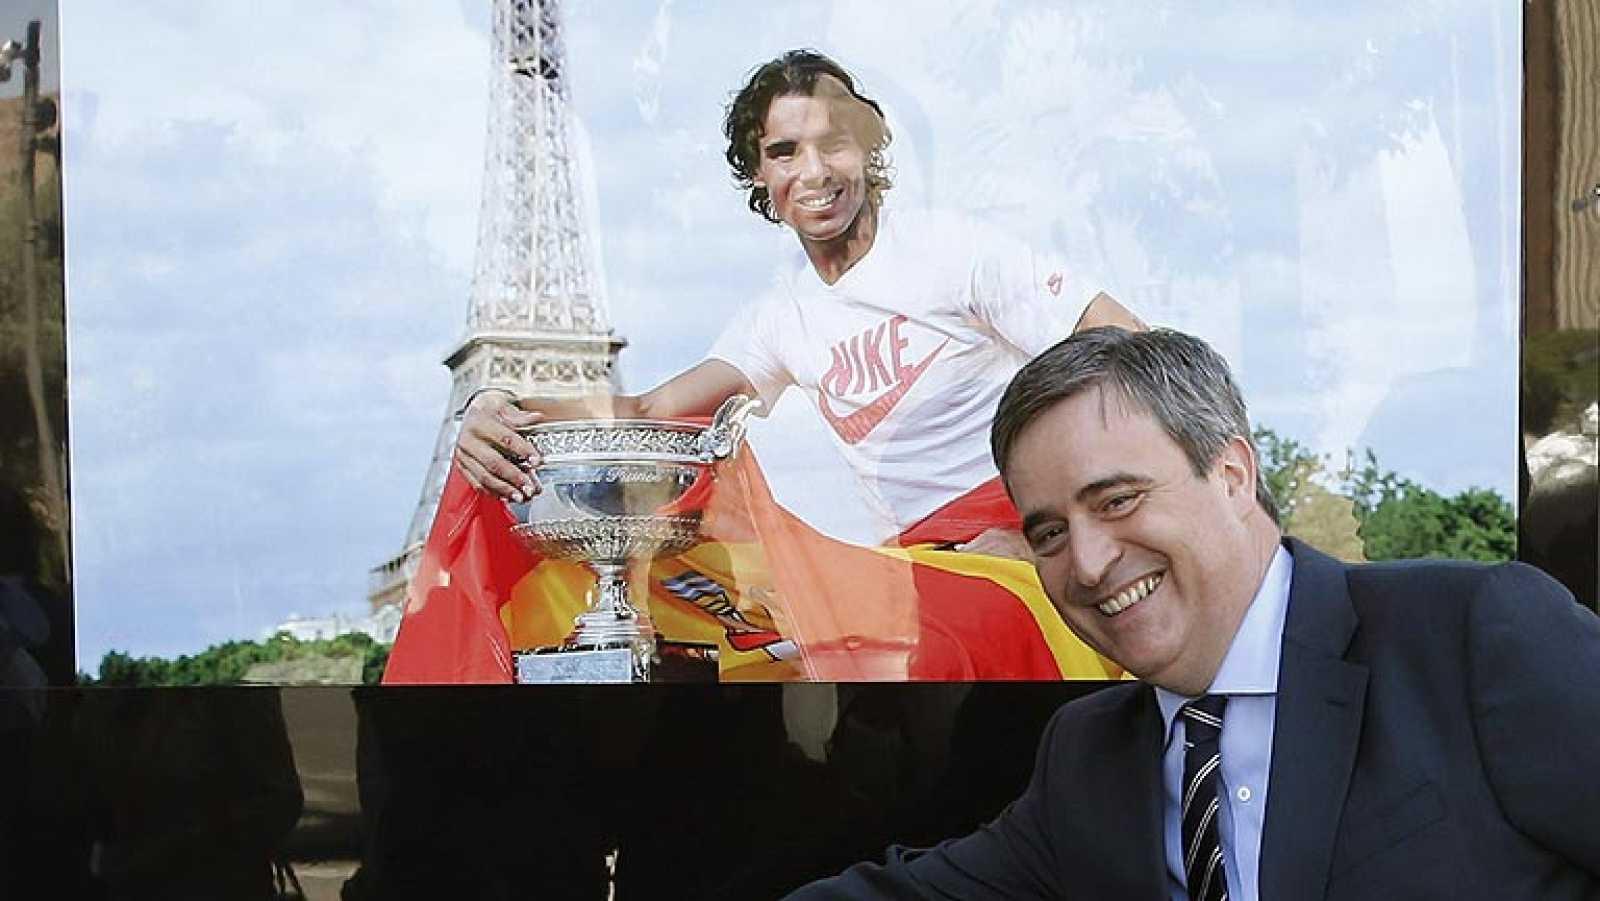 Los héroes del deporte español elogian a Rafa Nadal